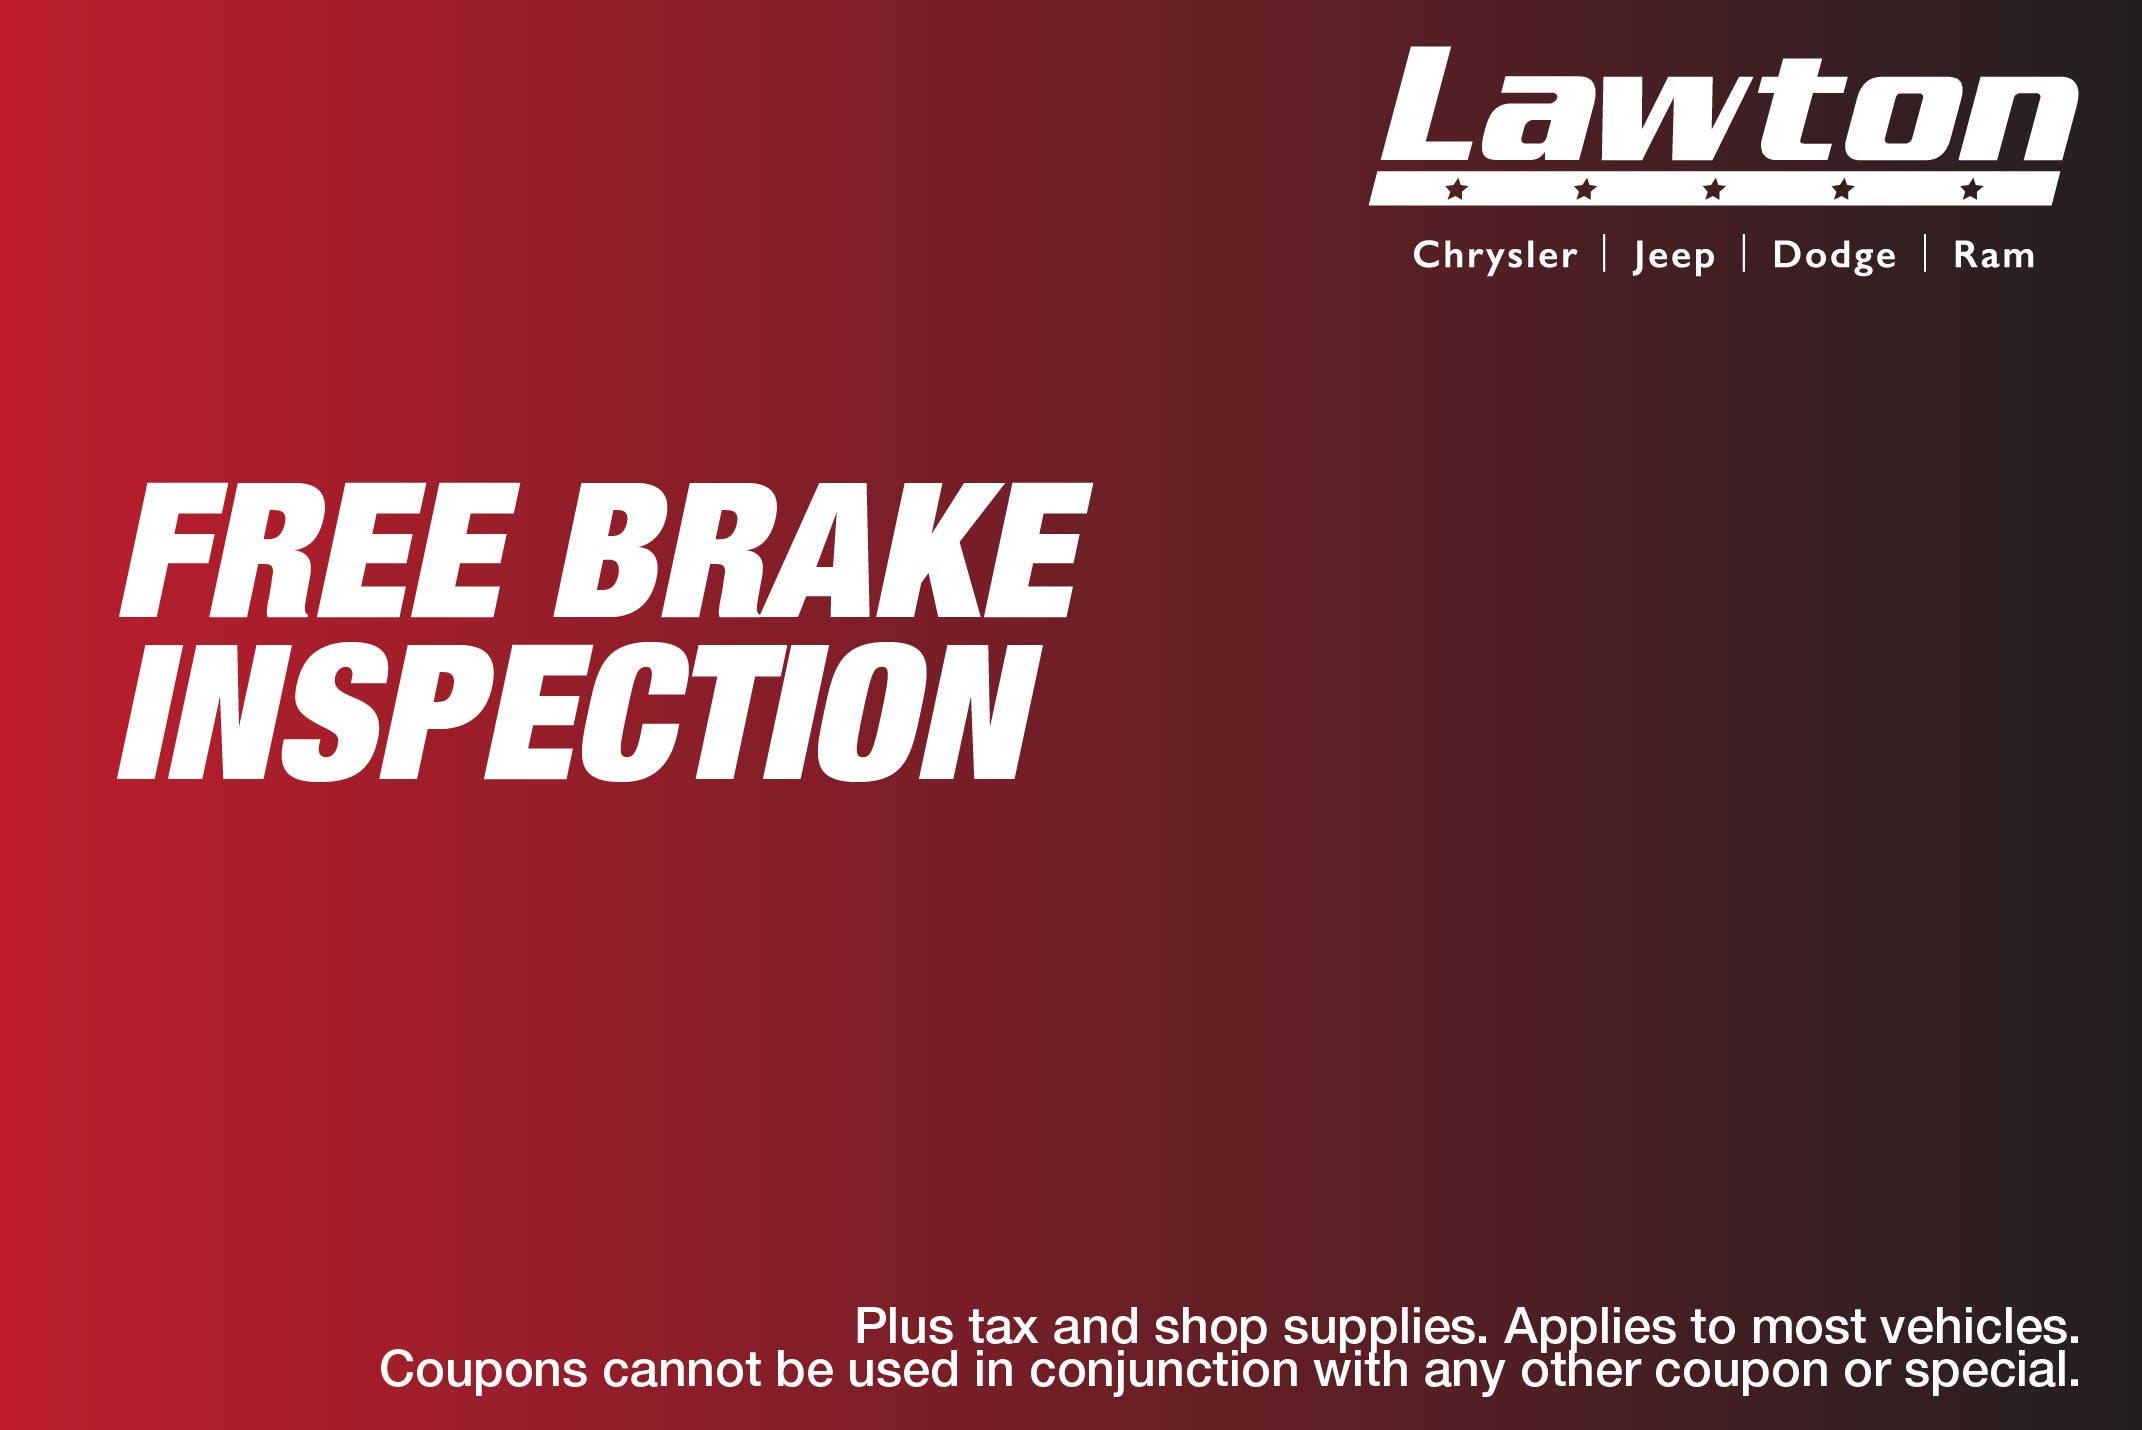 Free Brake Inspection Near Me >> Brake Inspection Lawton Chrysler Jeep Dodge Ram Specials Lawton Ok